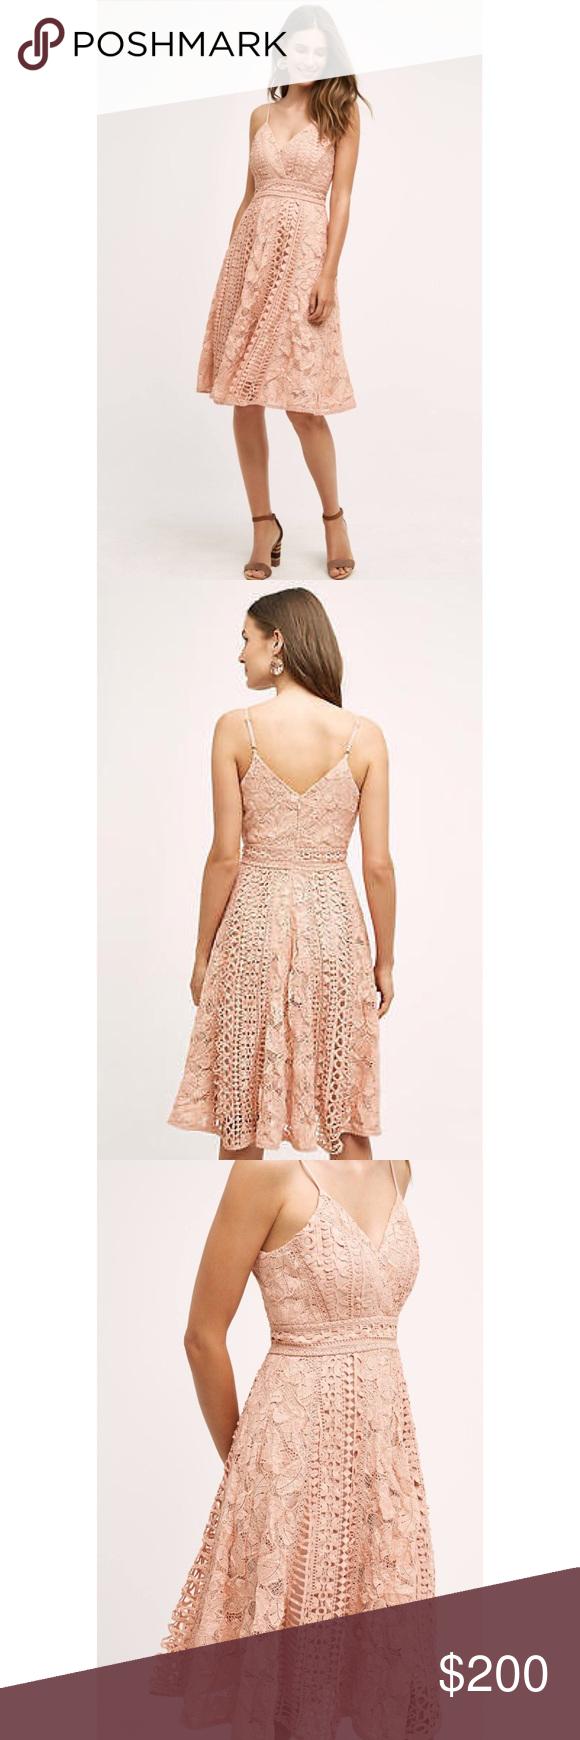 Anthropologie astrid dress nwt pinterest lace design blush pink